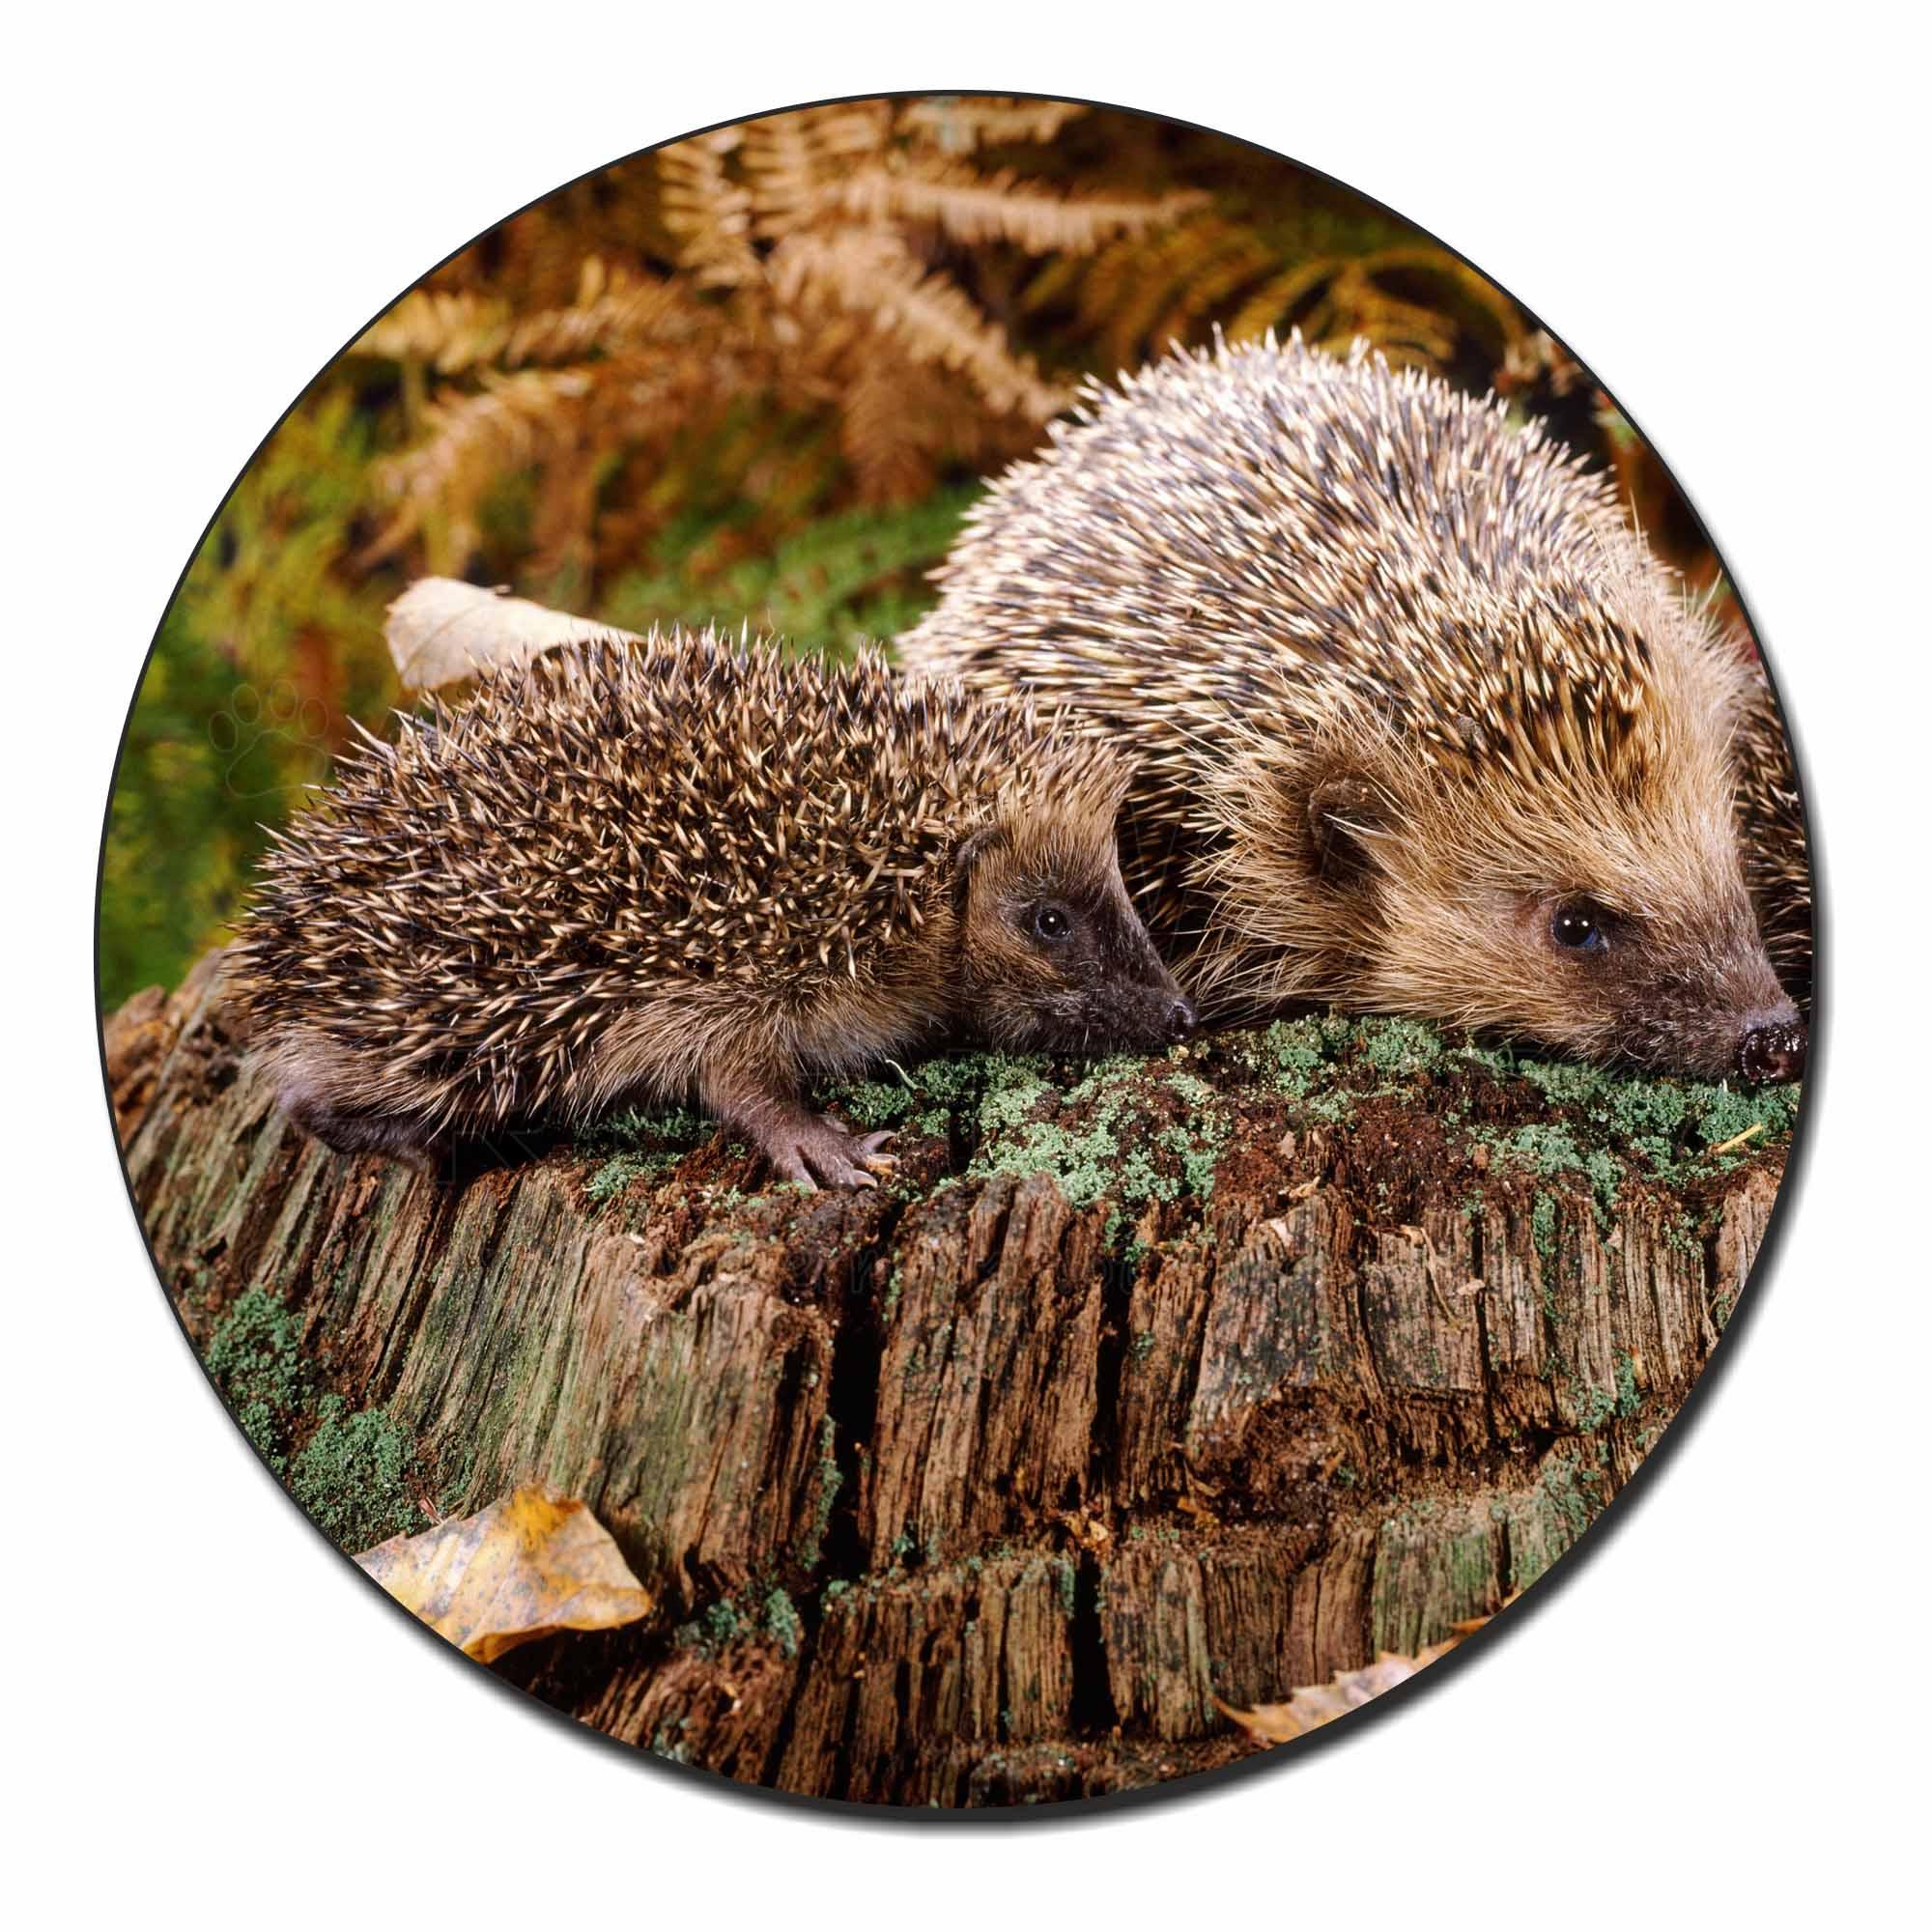 Mother and Baby Hedgehog Fridge Magnet Stocking Filler Christmas Gift AHE-5FM